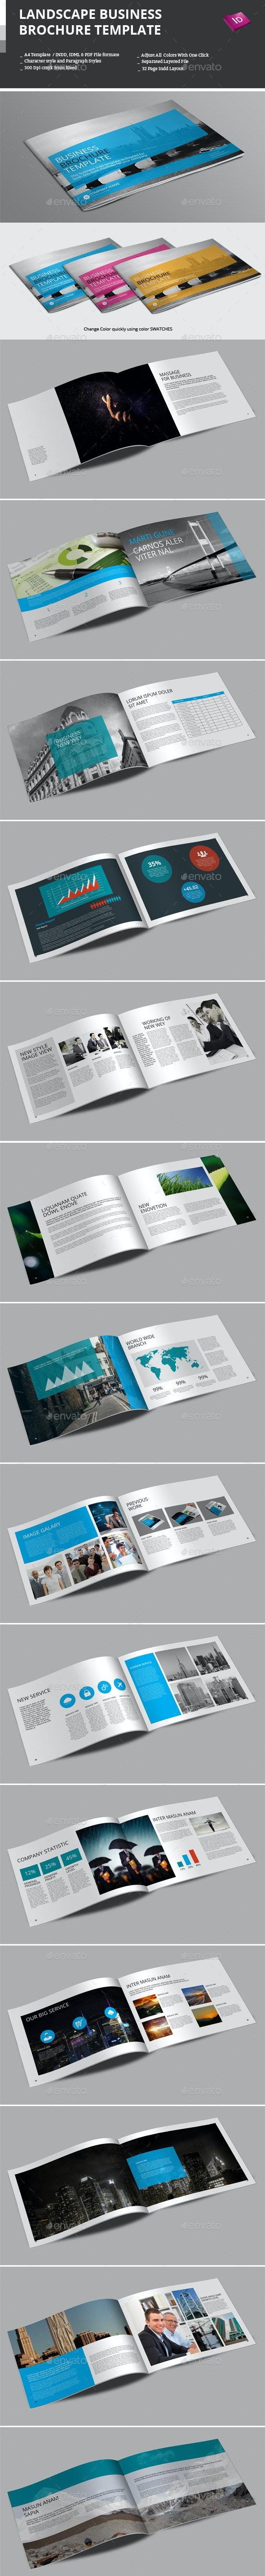 Landscape Business Brochure Template - Corporate Brochures